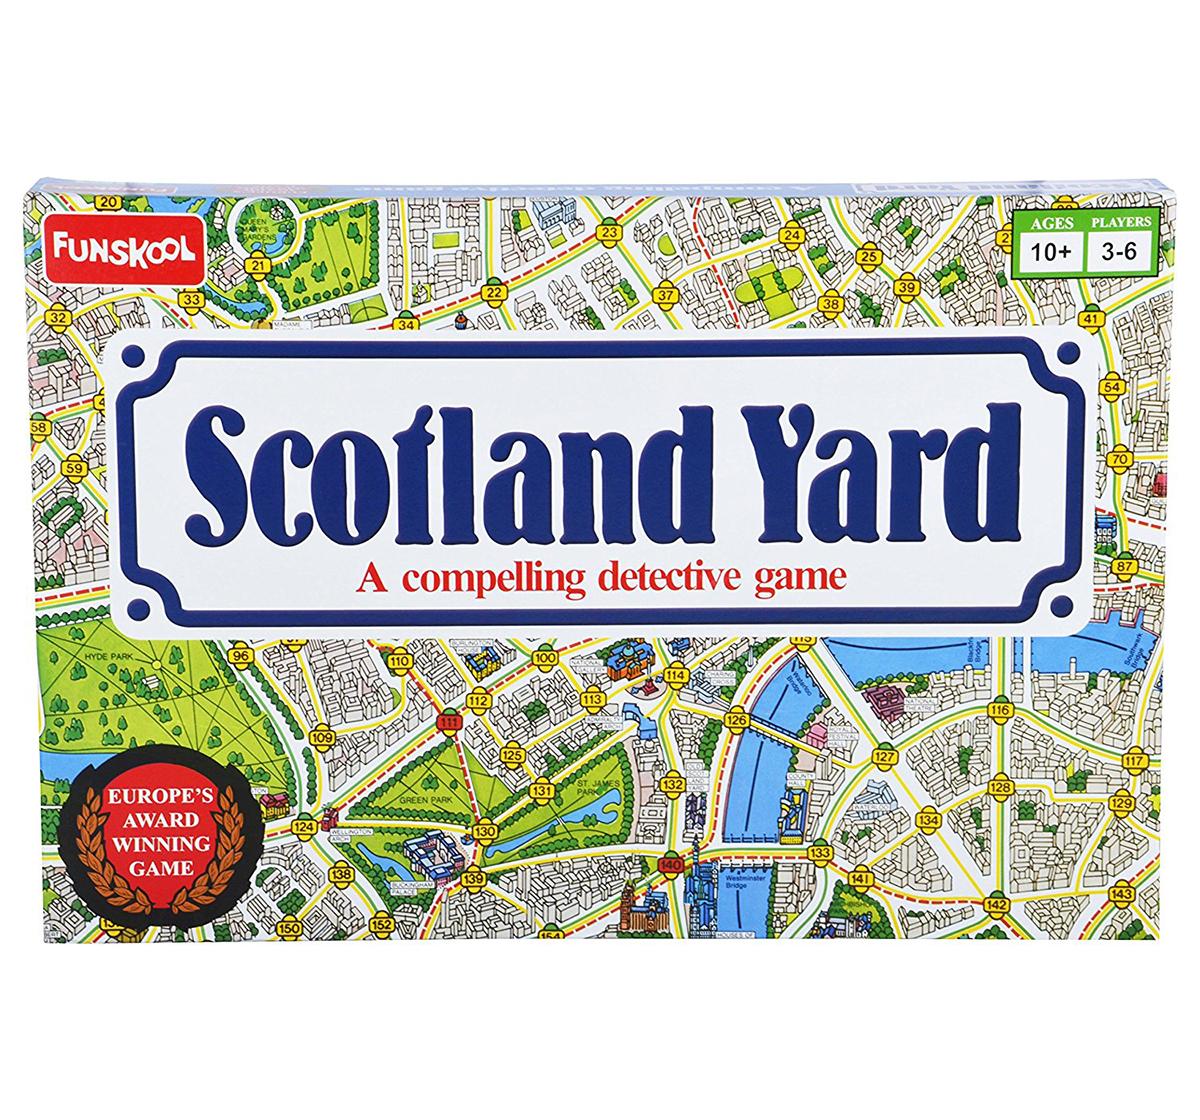 Funskool | Funskool Scotland Yard Board Games for Kids age 10Y+